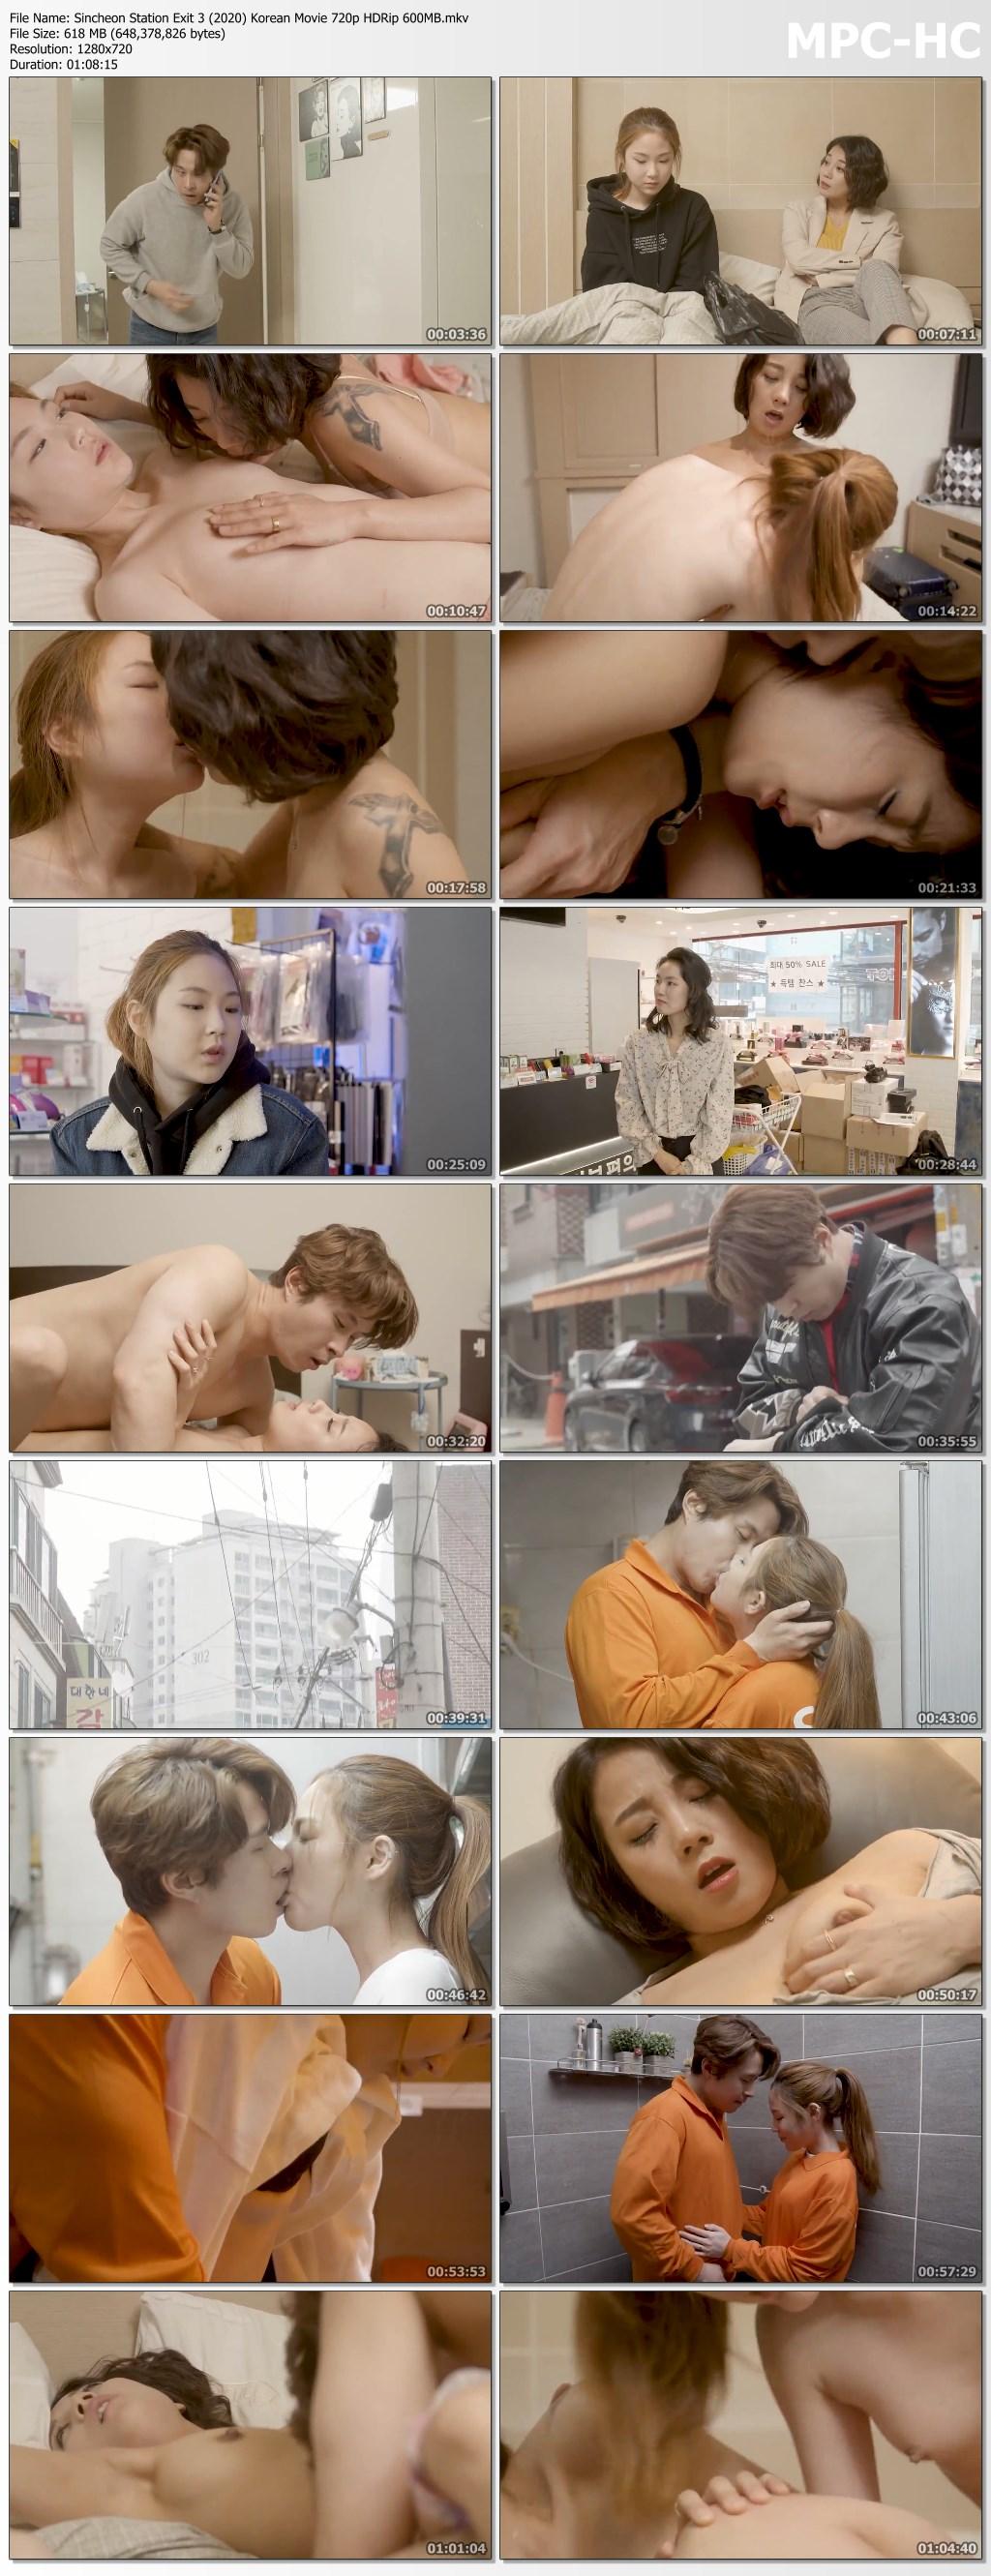 Sincheon Station Exit 3 (2020) Korean Movie 720p HDRip 600MB.mkv thumbs